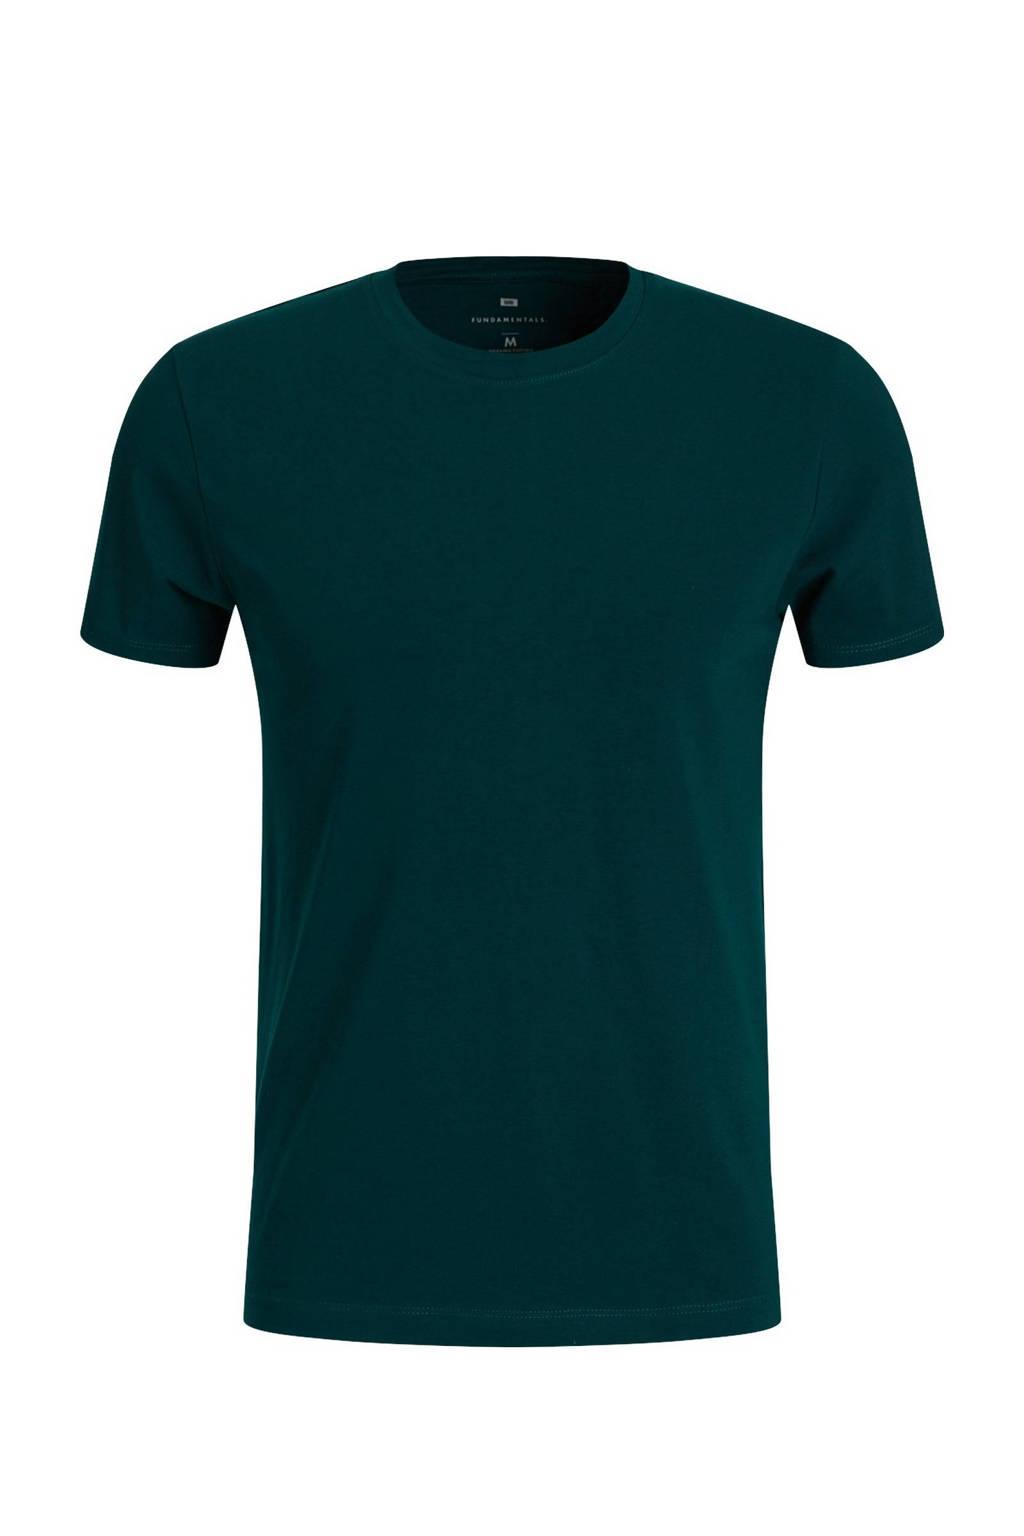 WE Fashion T-shirt petrol, Petrol